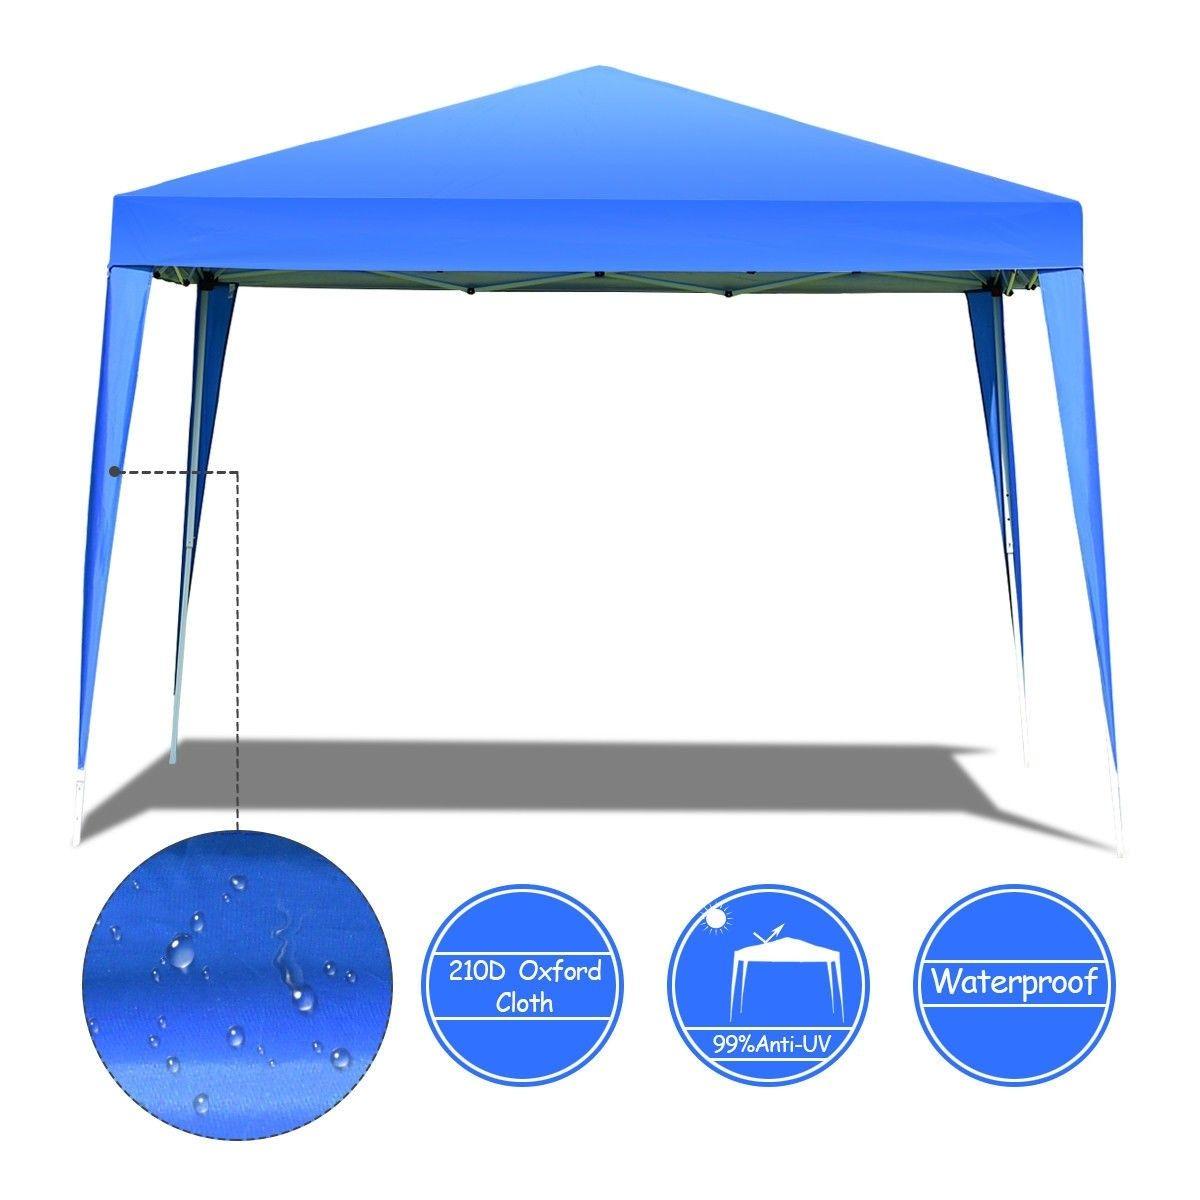 Outdoor Foldable Portable Shelter Gazebo Canopy Tent Portable